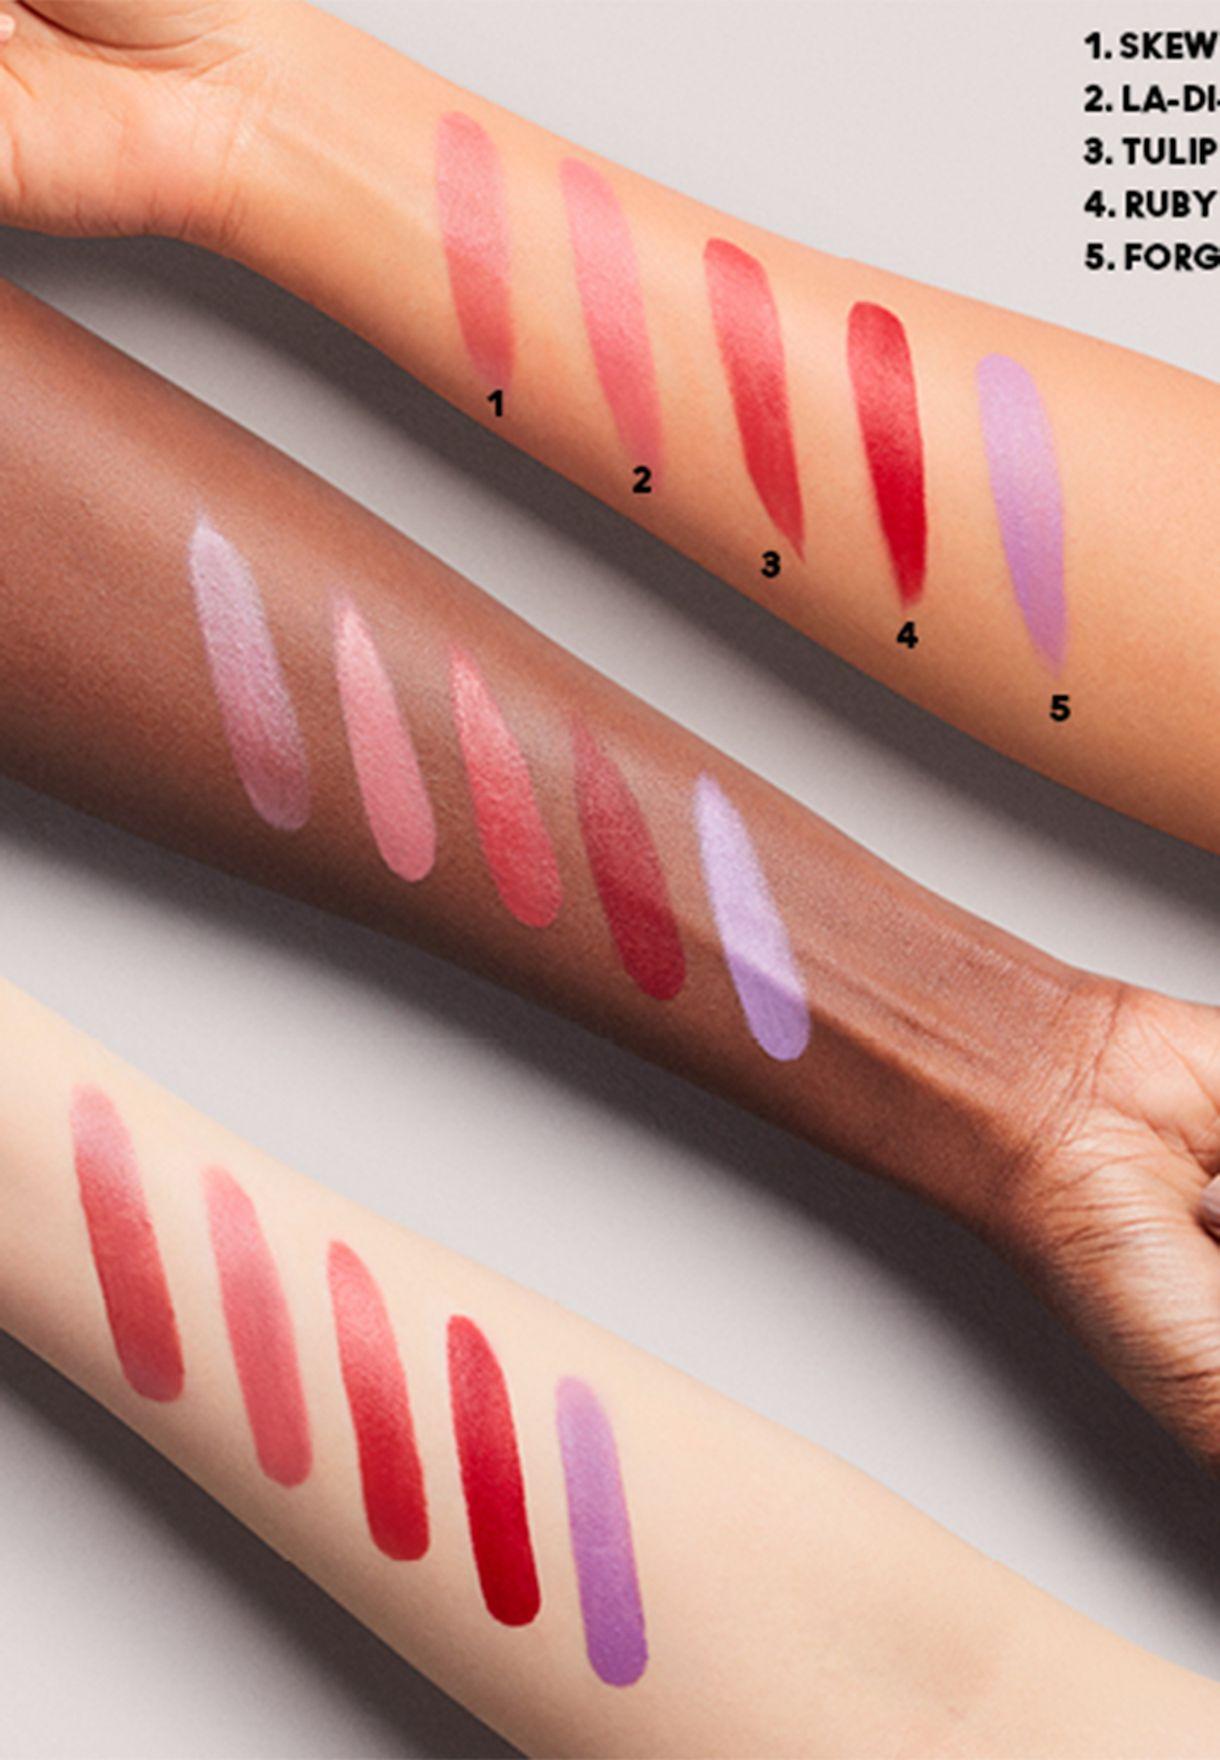 Lipstick - Ruby Woo